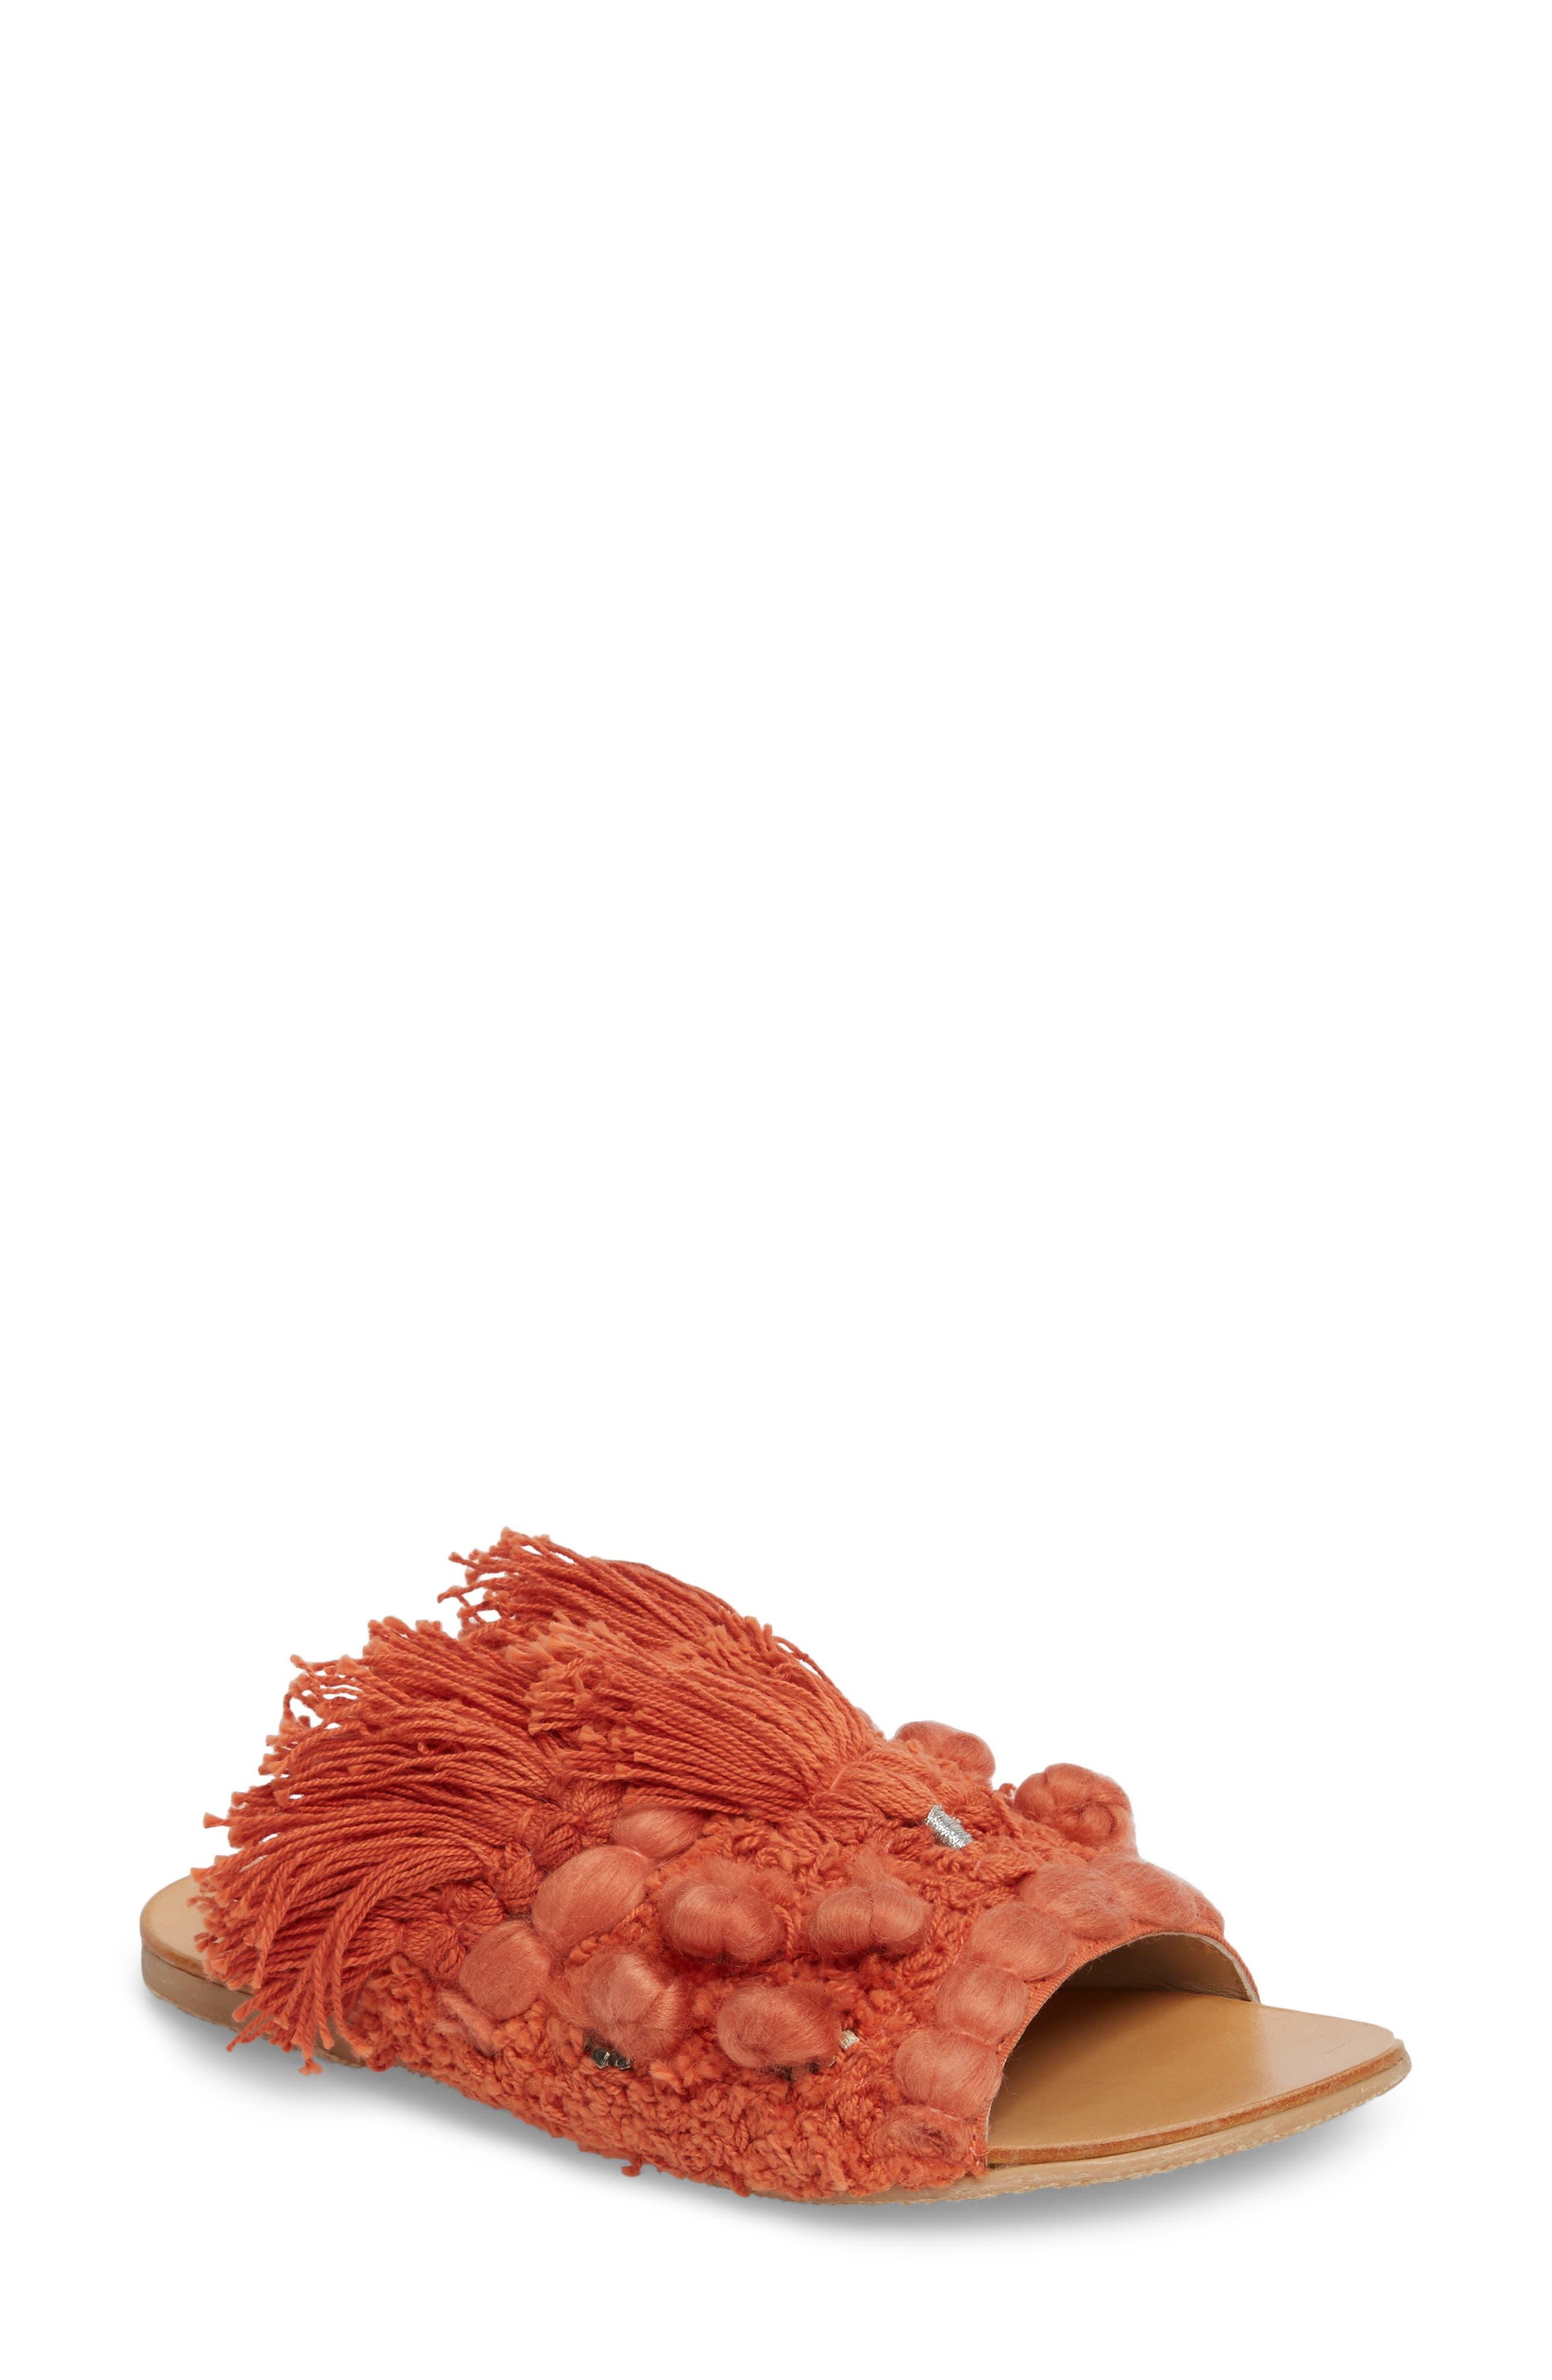 Mars at Night Tasseled Slide Sandal,                         Main,                         color, Coral